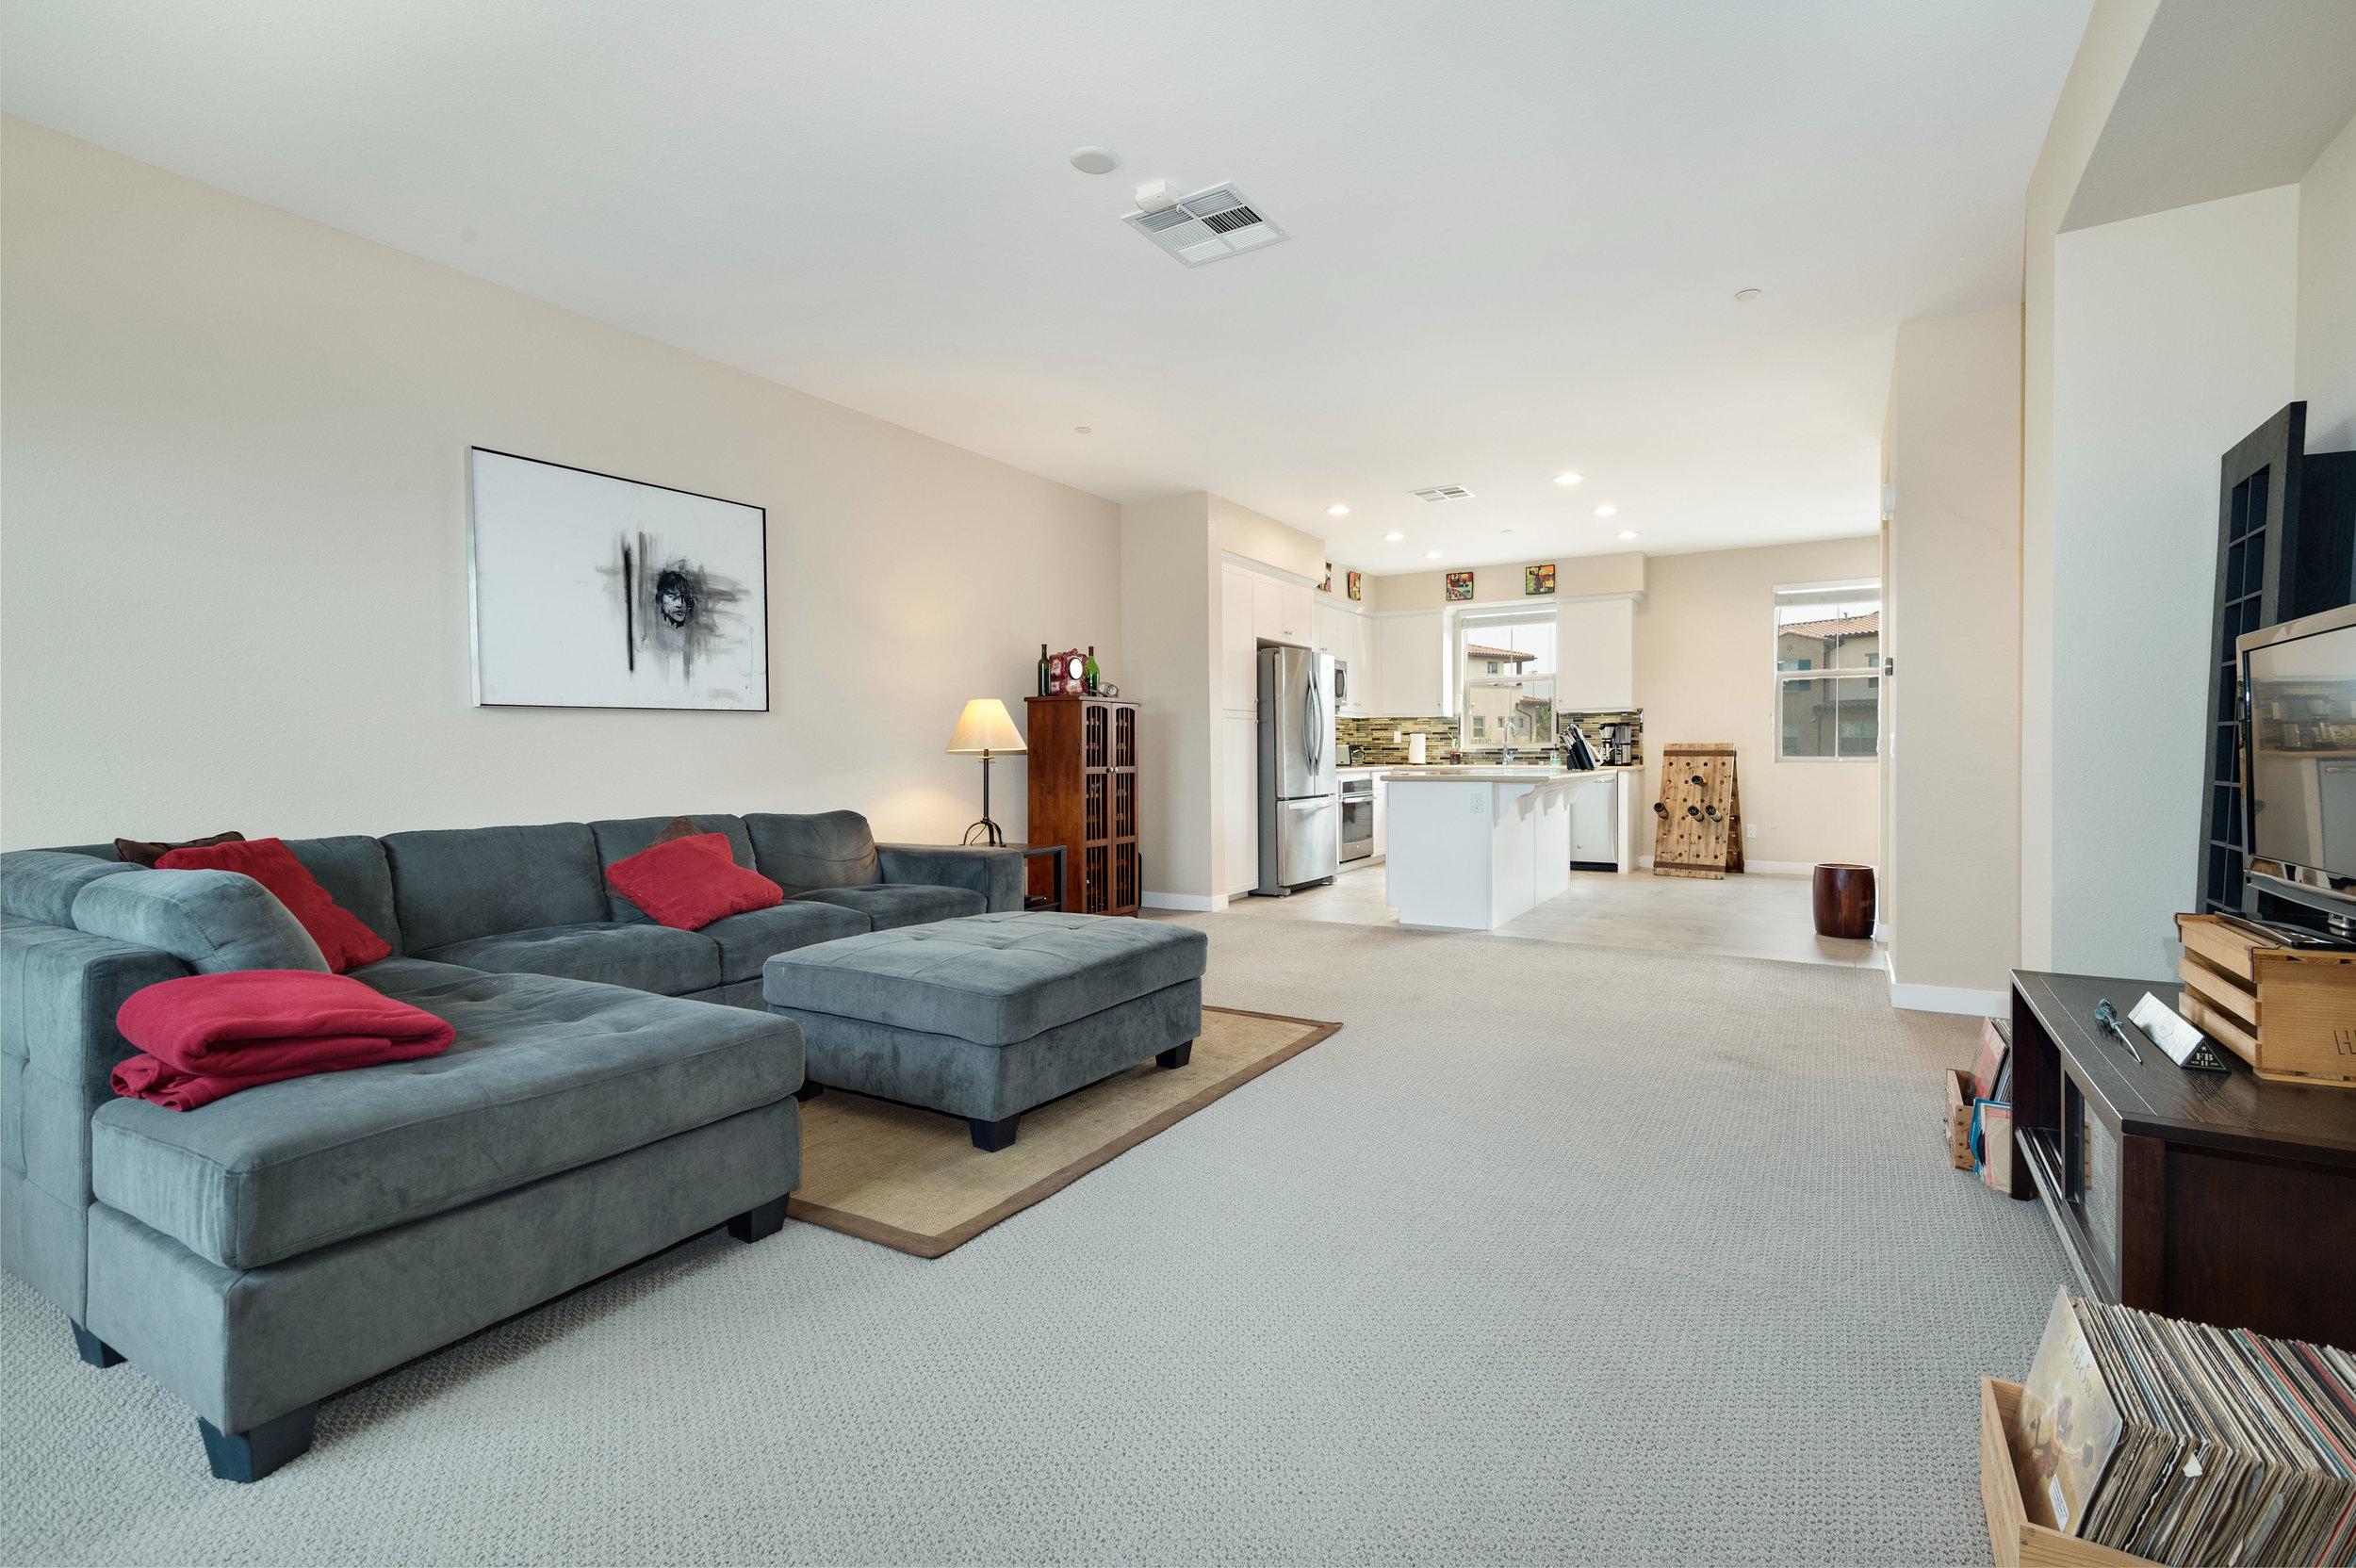 002 Living Room 207 Westpark Court Unit 702 Camarillo Bally Khehra For Sale Lease The Malibu Life Team Luxury Real Estate.jpg